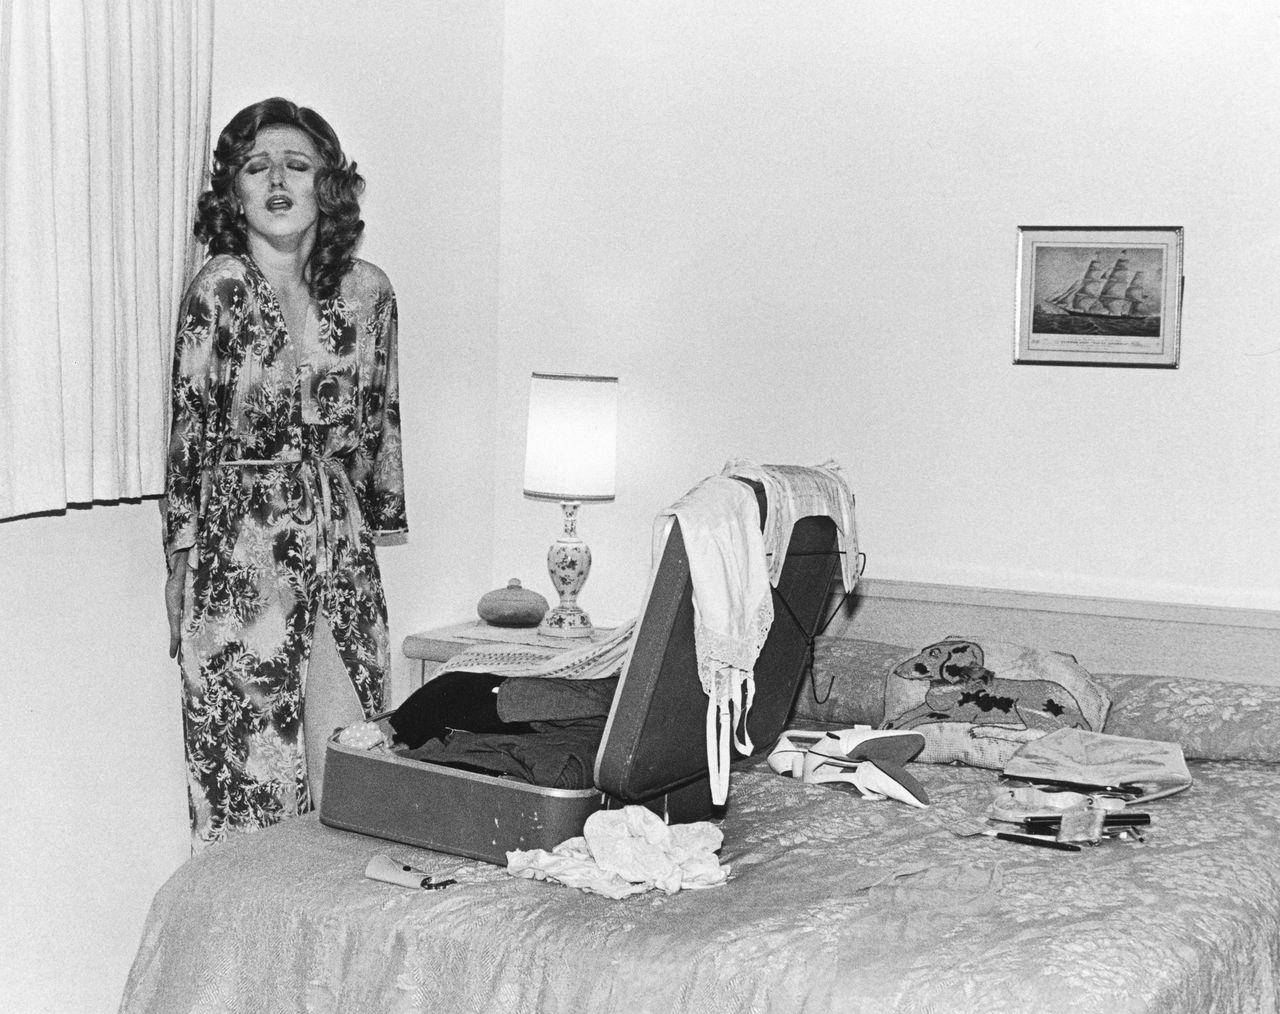 Cindy Sherman, <em>Untitled Film Still #12</em>, 1978.